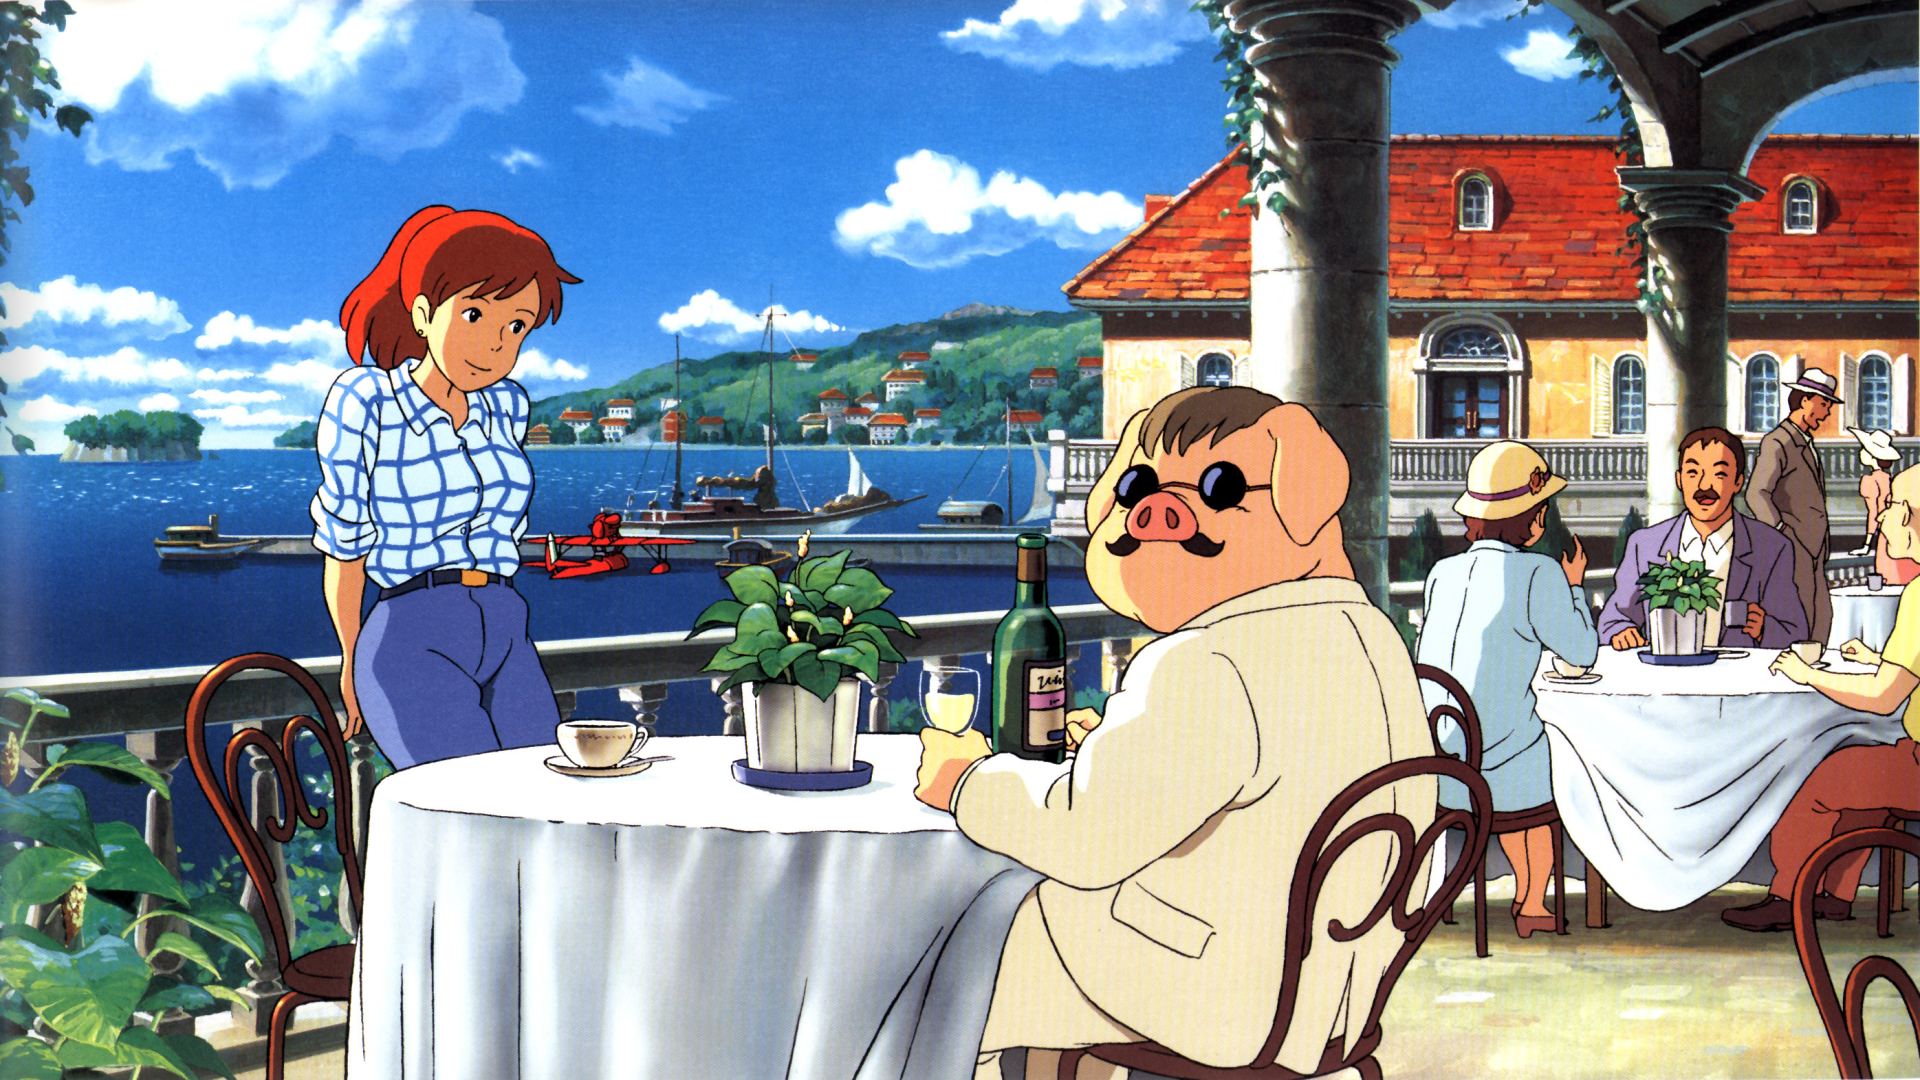 Porco Rosso Hayao Miyazaki Wallpaper 41633576 Fanpop